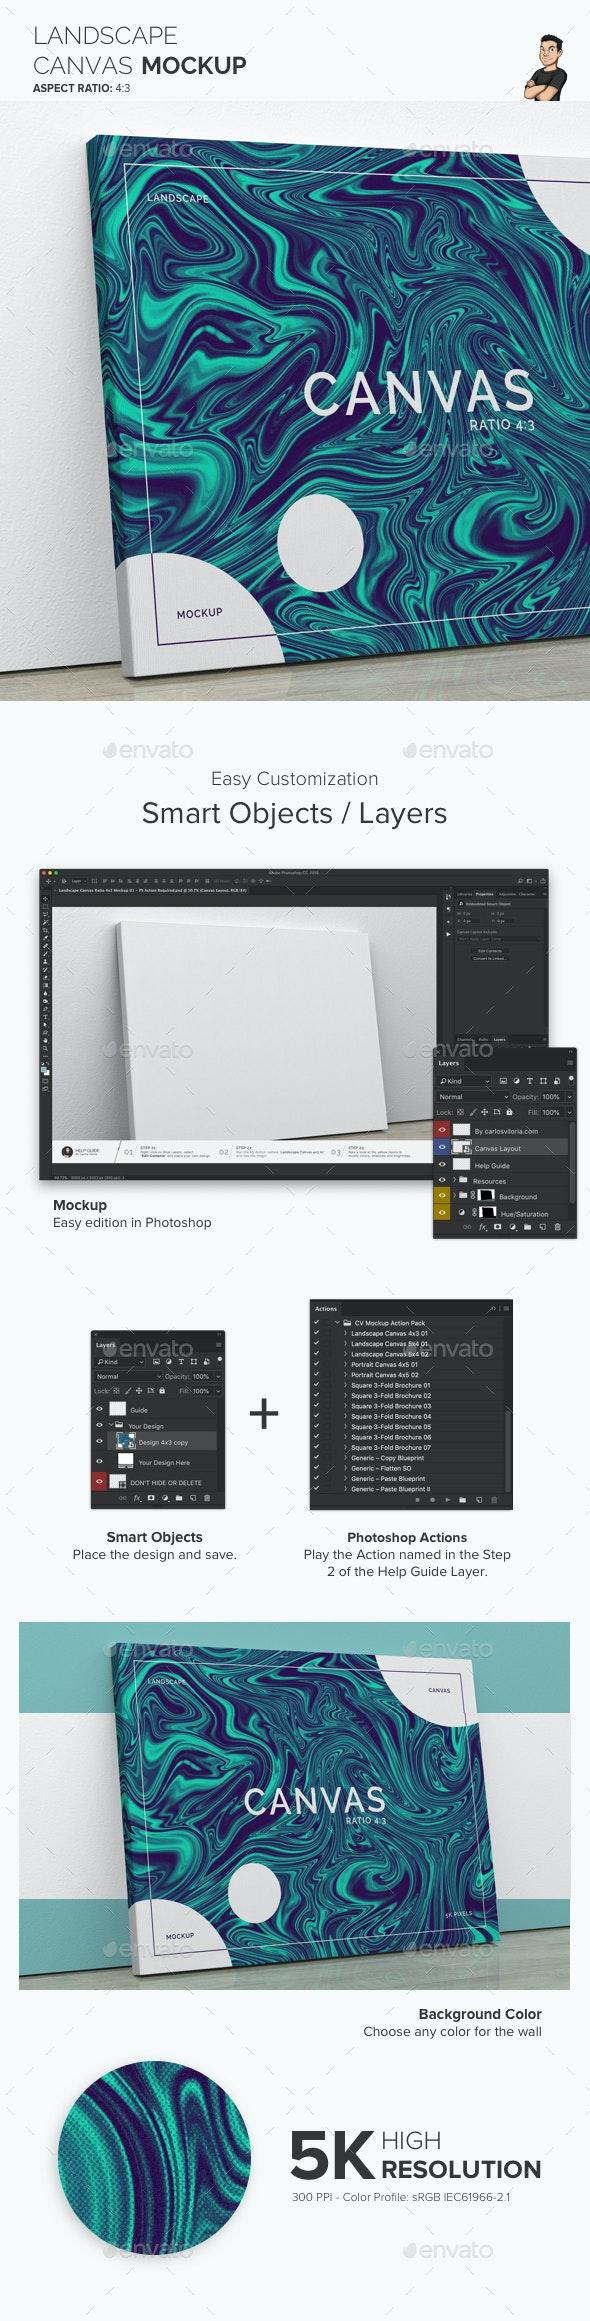 Landscape Canvas Ratio 4x3 Mockup 01 - Print Product Mock-Ups